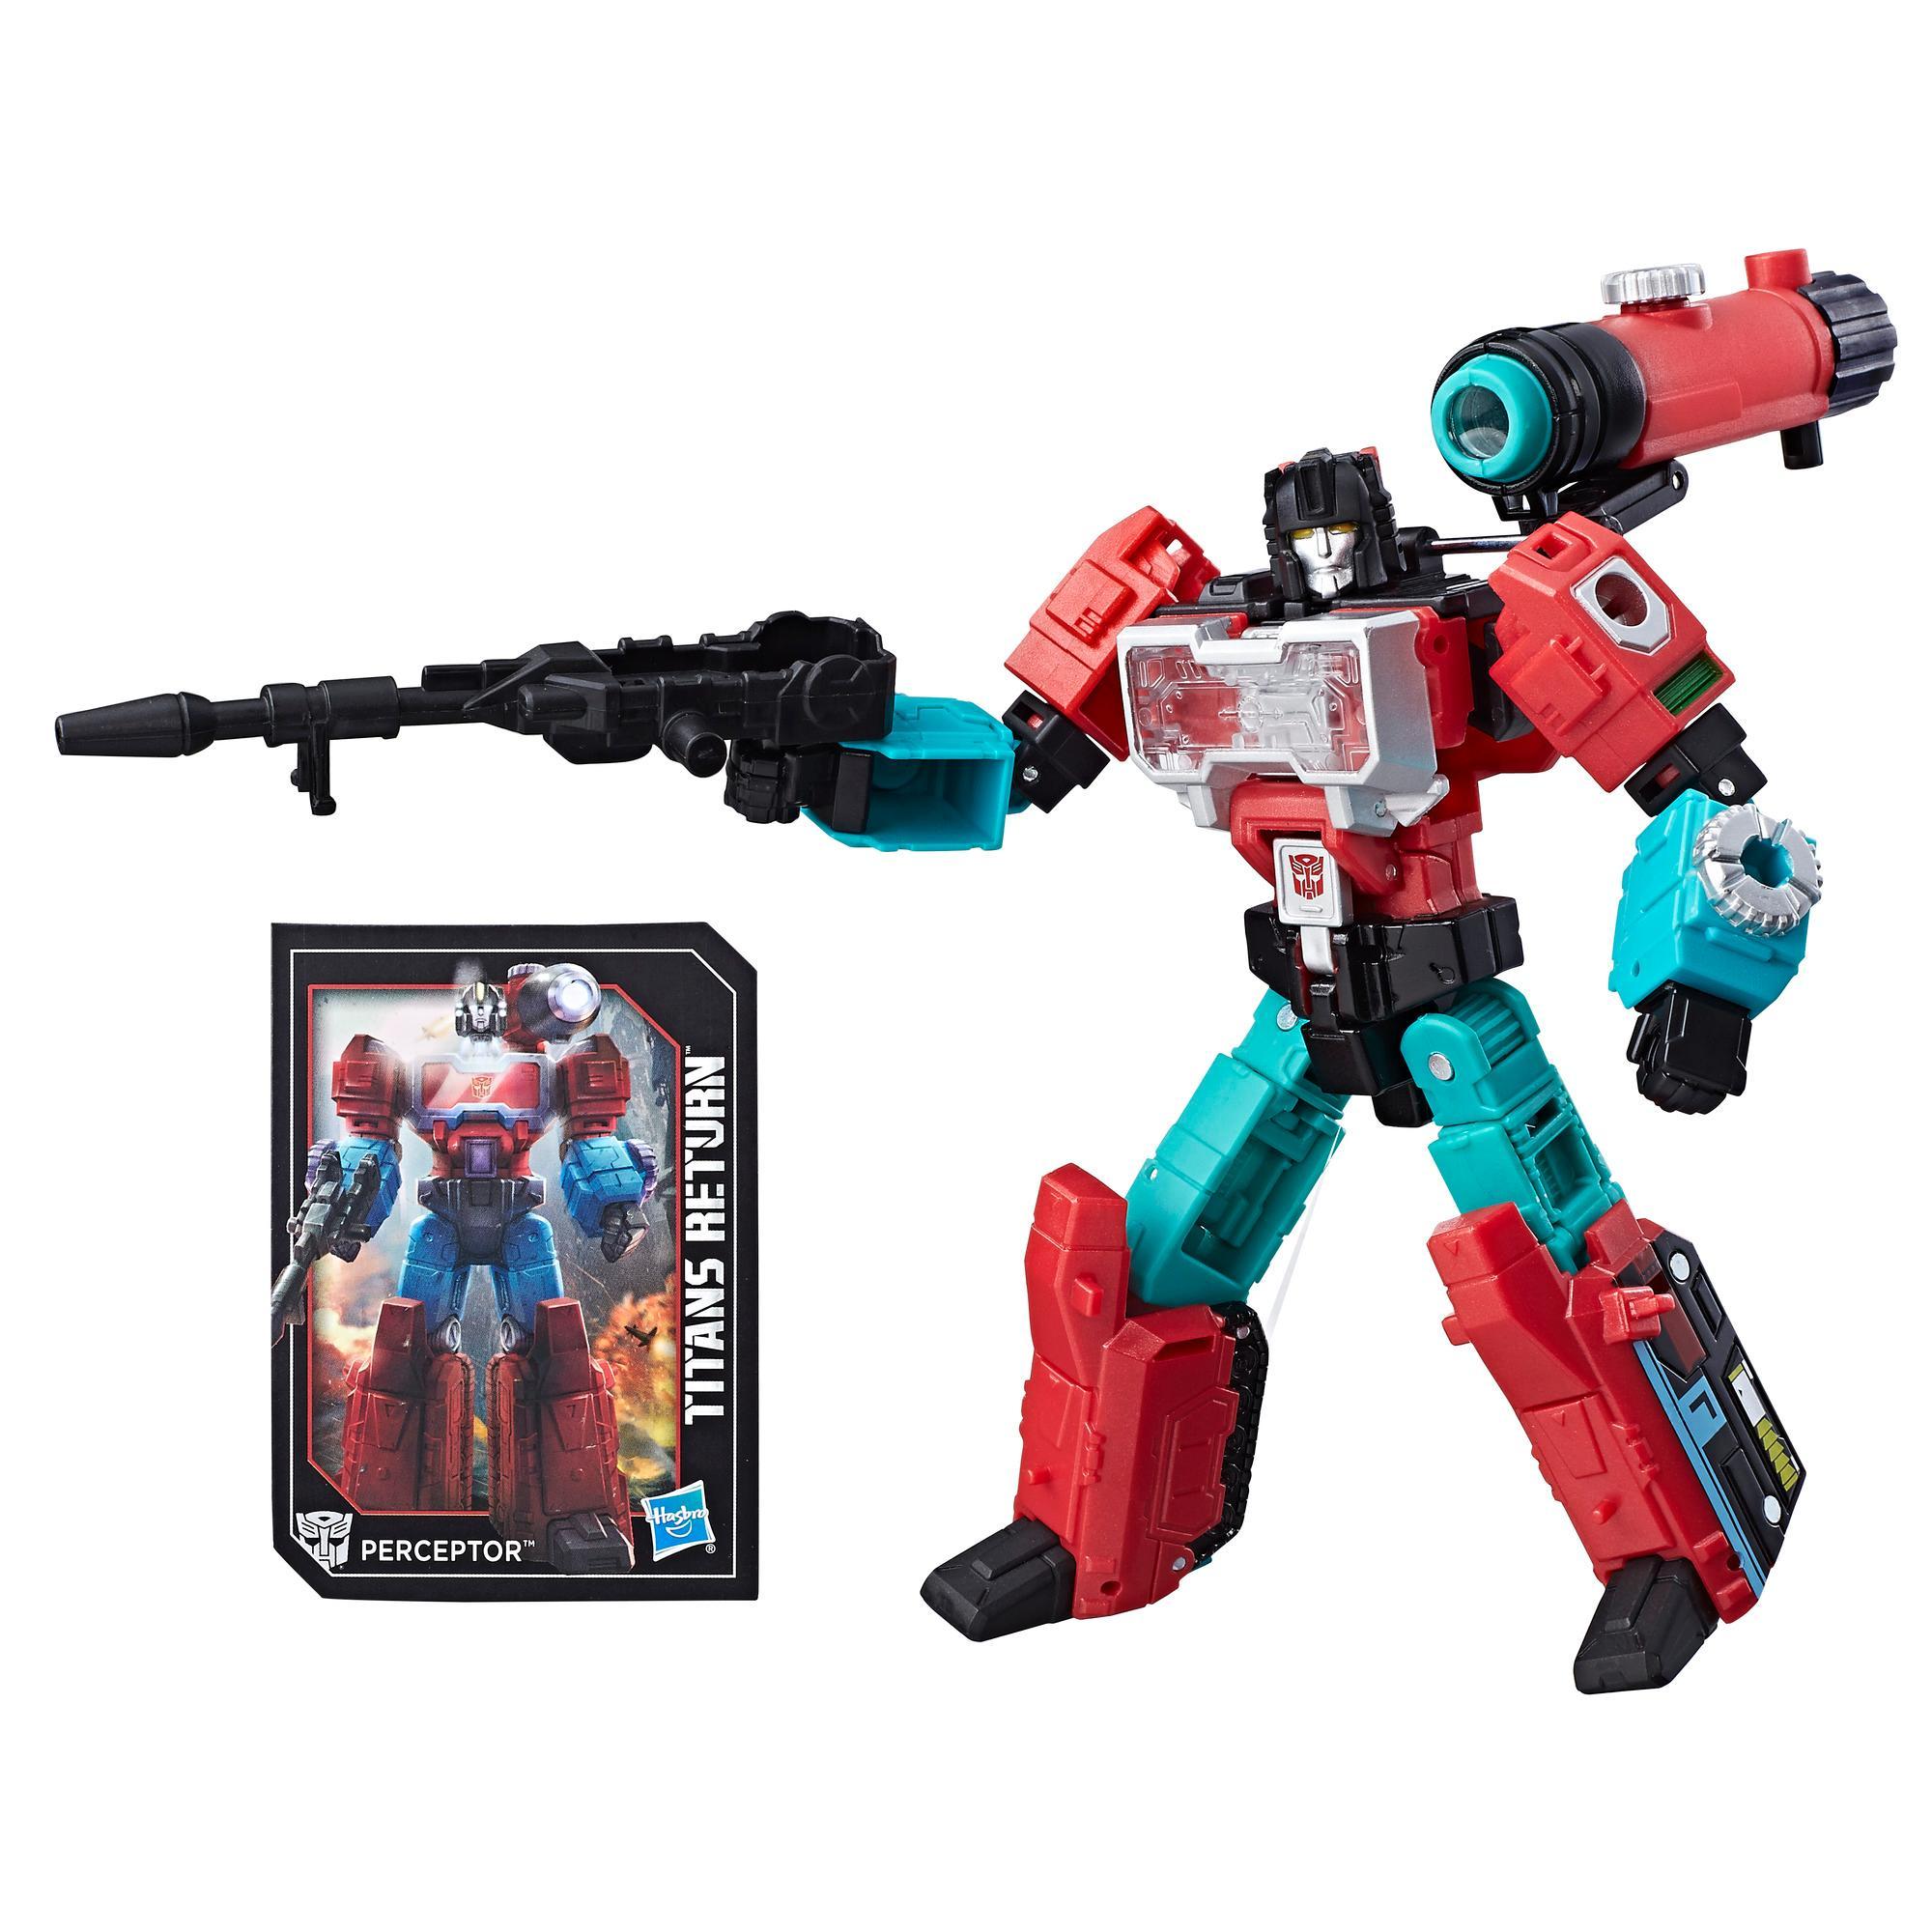 Transformers Generations Titans Return Deluxe Class Autobot Perceptor & Convex